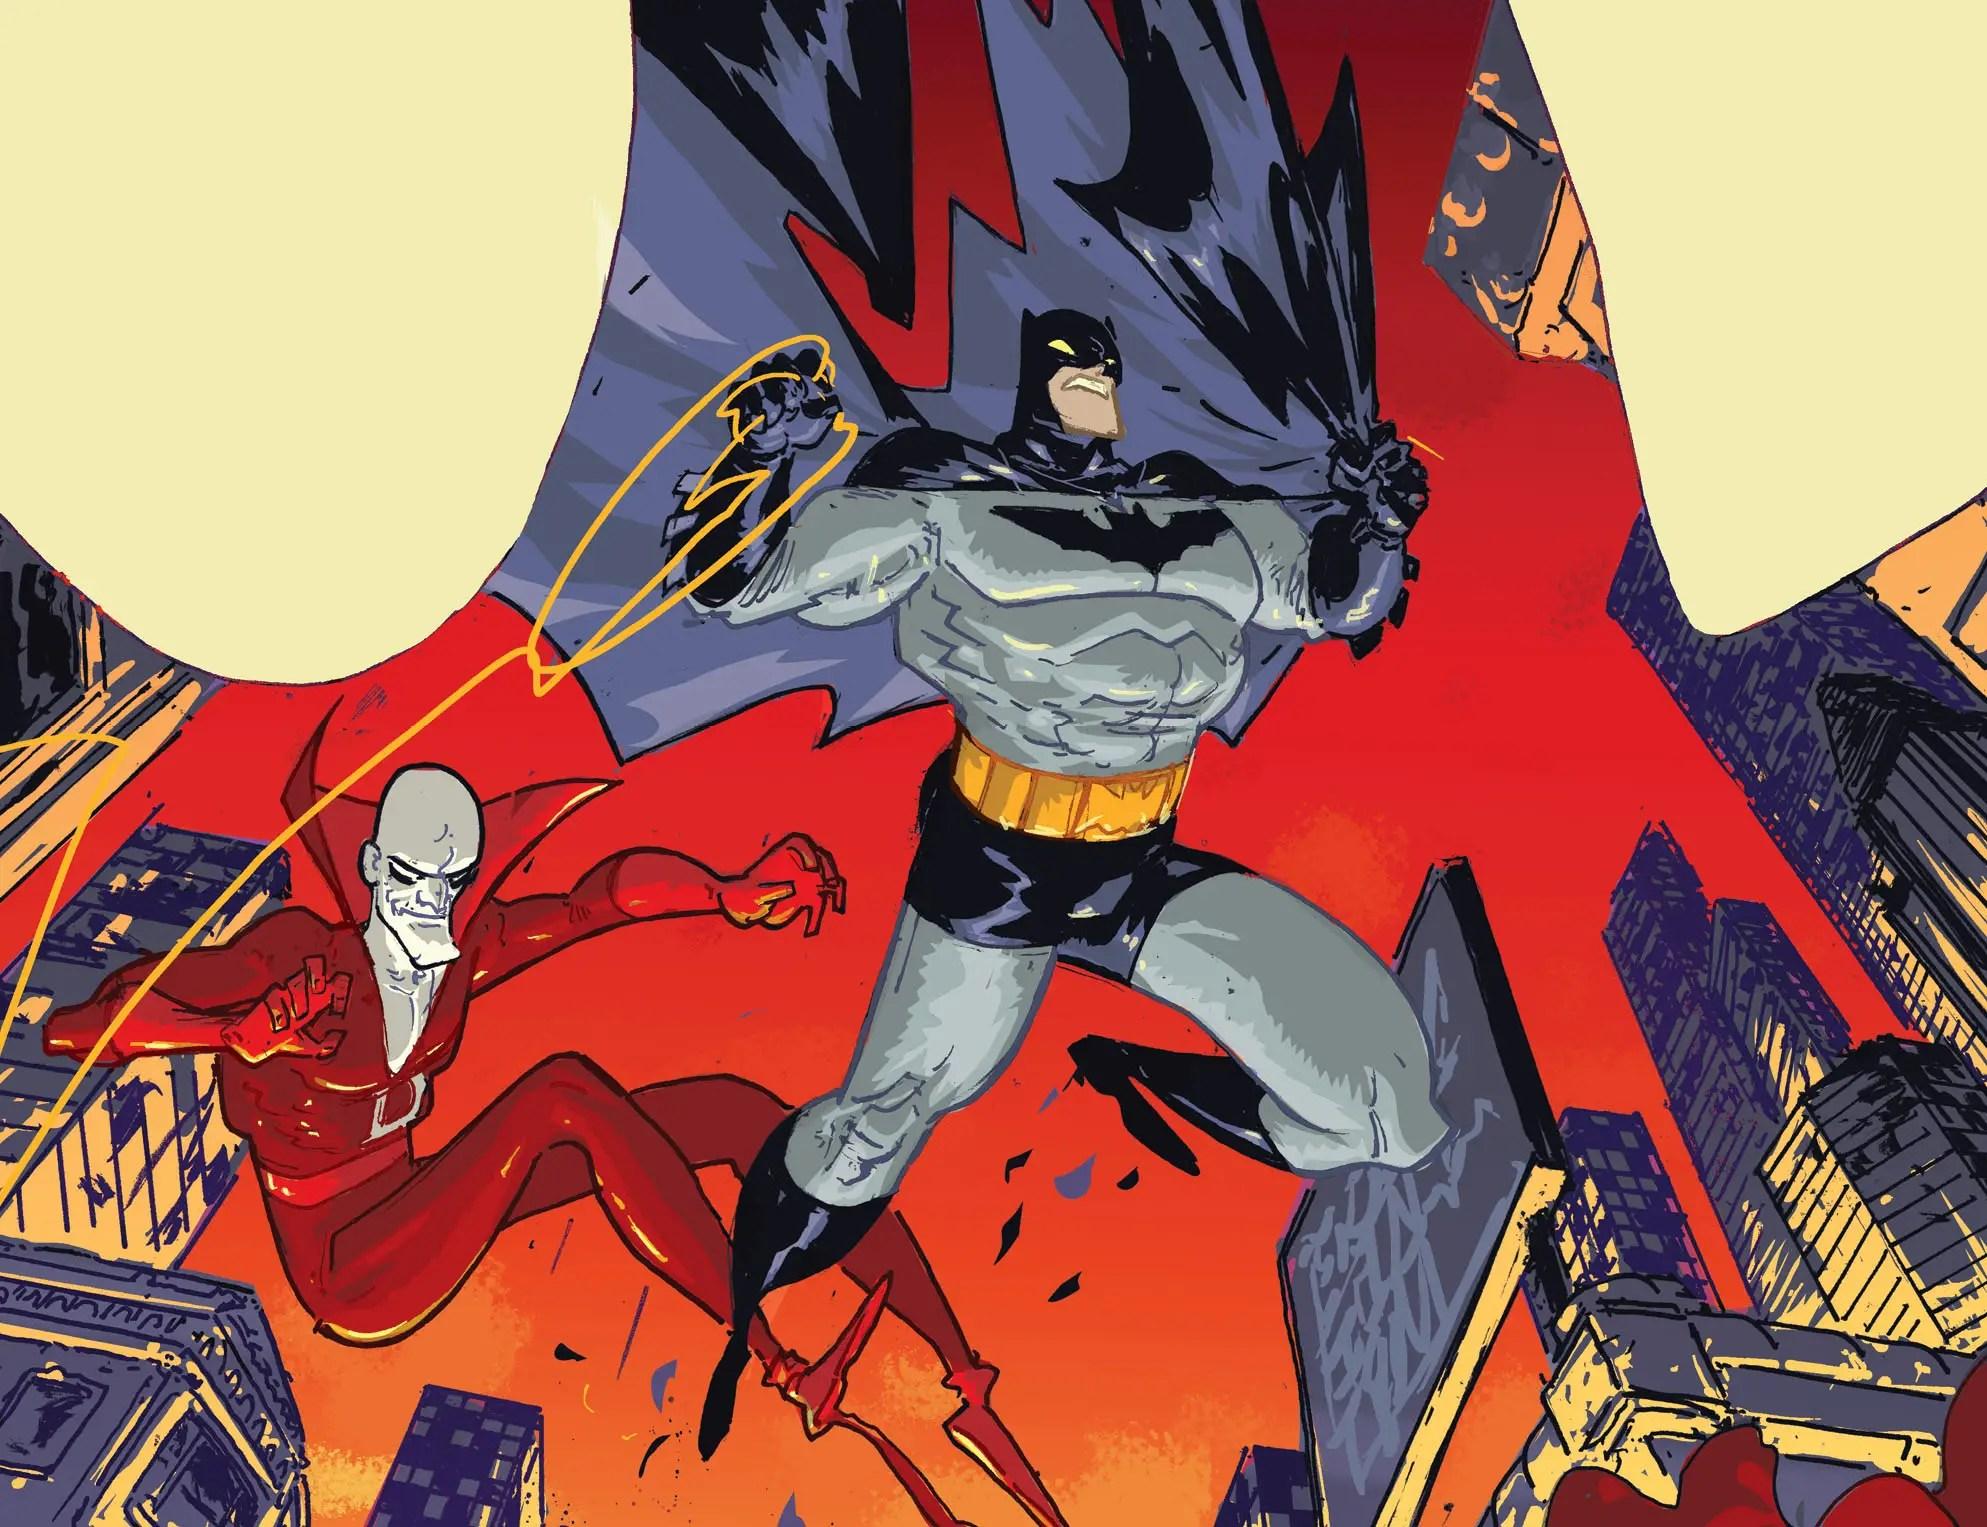 Batman: The Adventures Continue Season 2 #1 reinvents a beloved modern classic